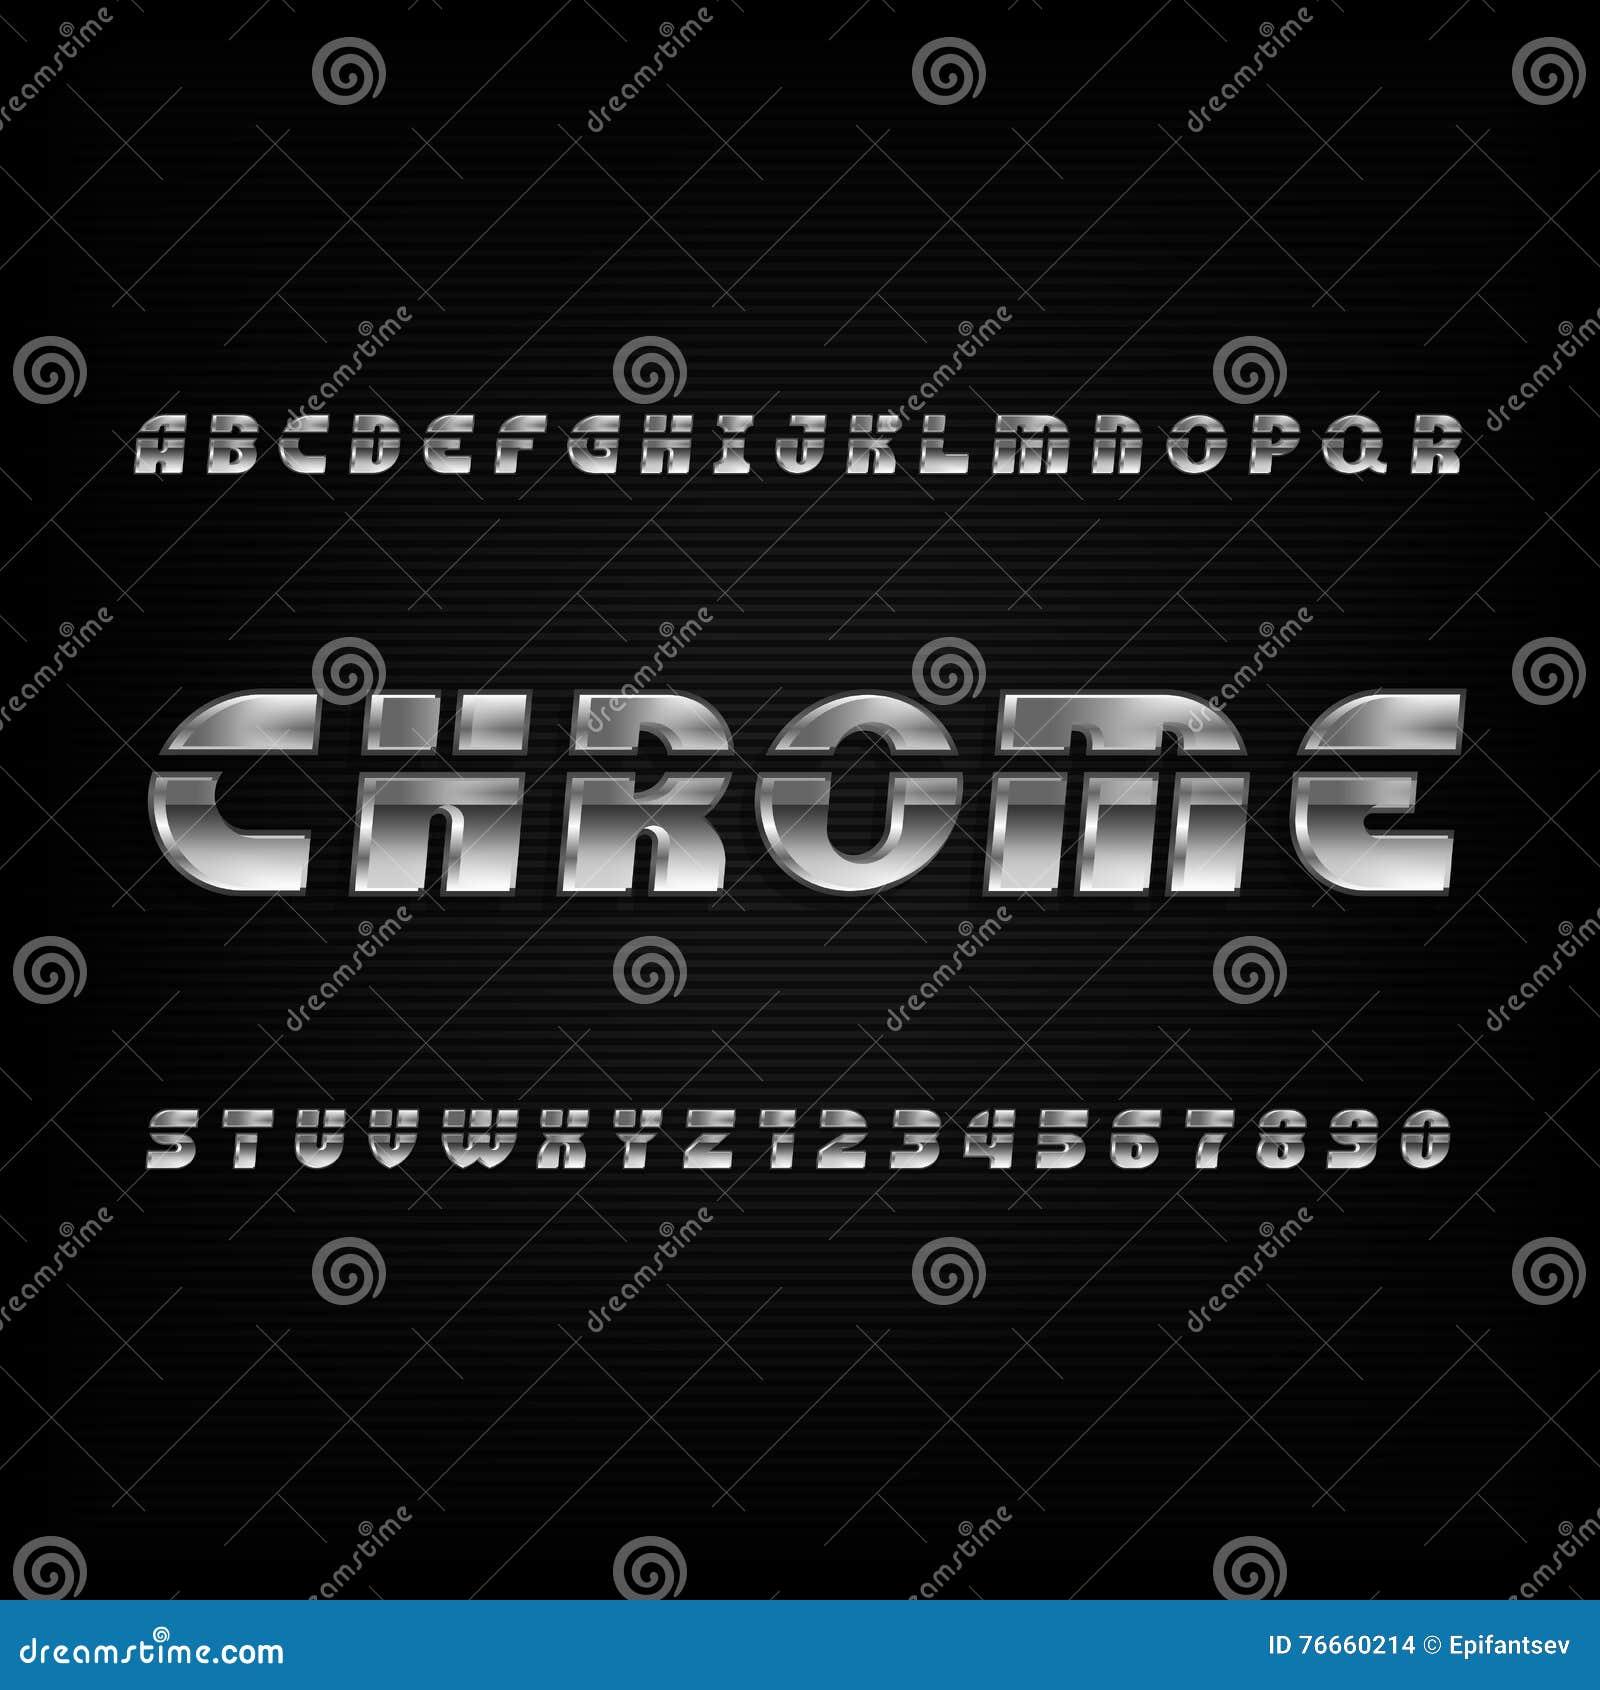 Text Decoration Italic: Chrome Alphabet Font. Metallic Effect Sans Serif Letters